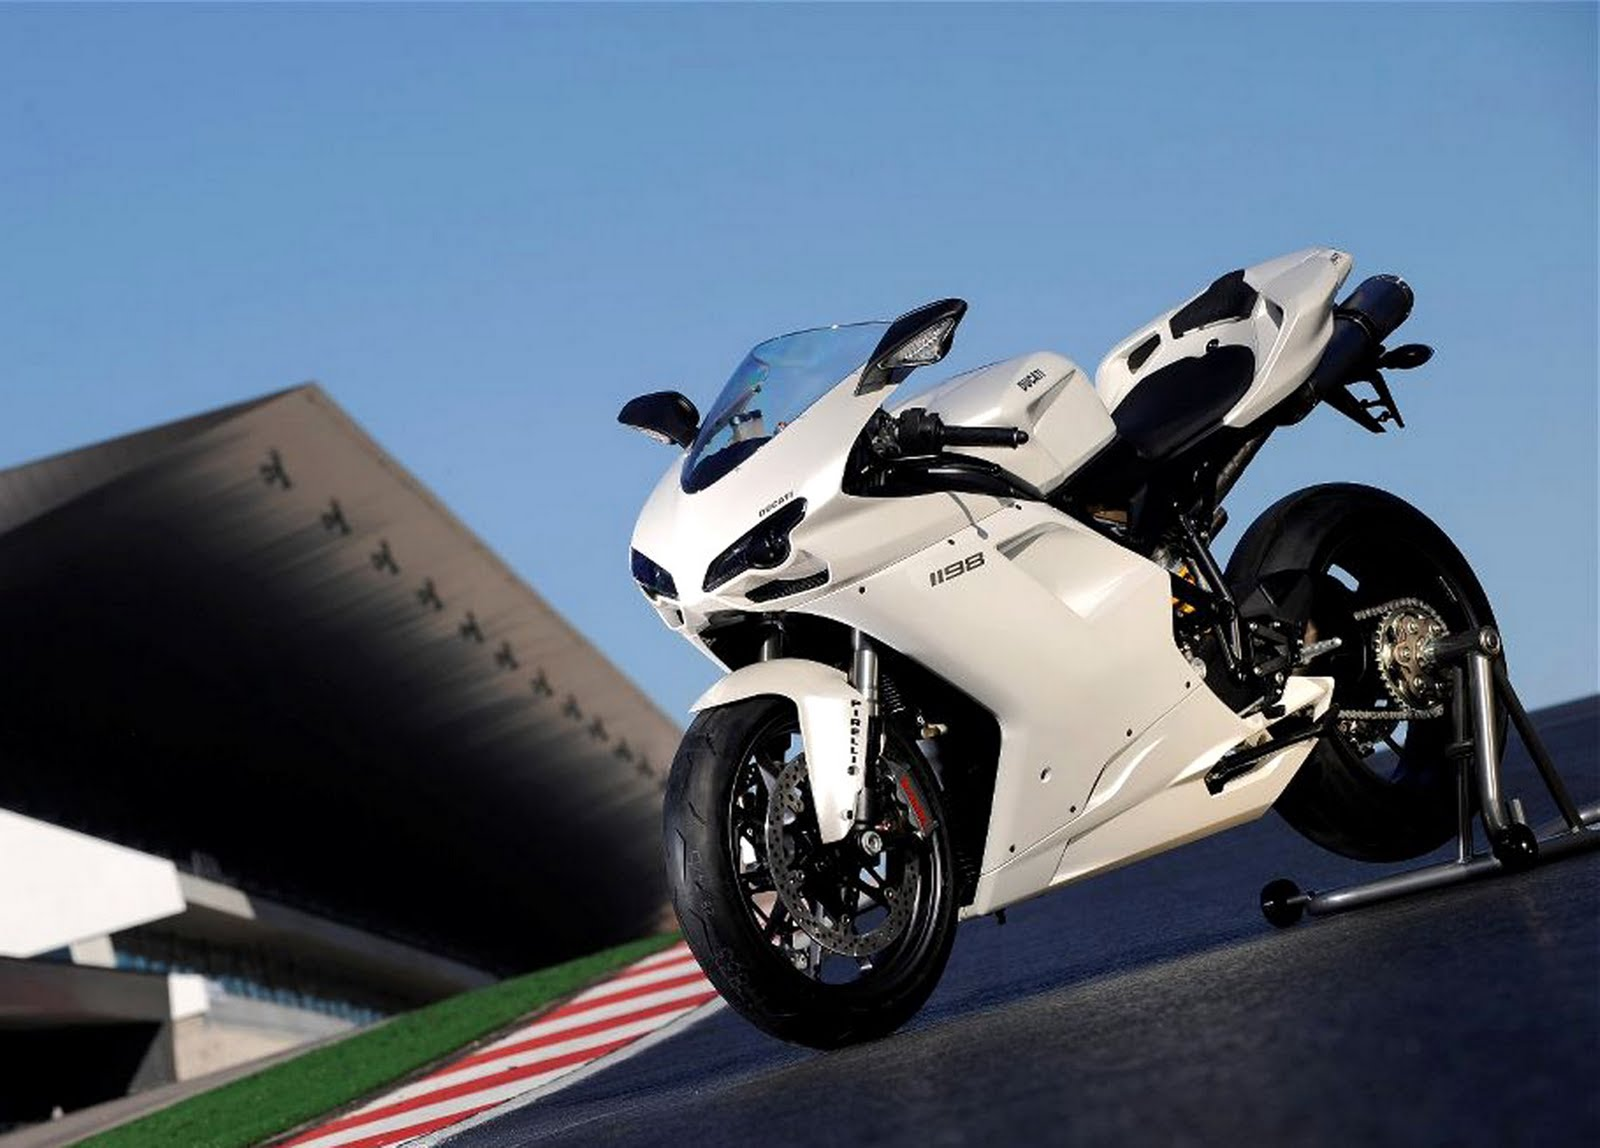 Ducati 1198s Racing Sport Bike: 1198 Ducati